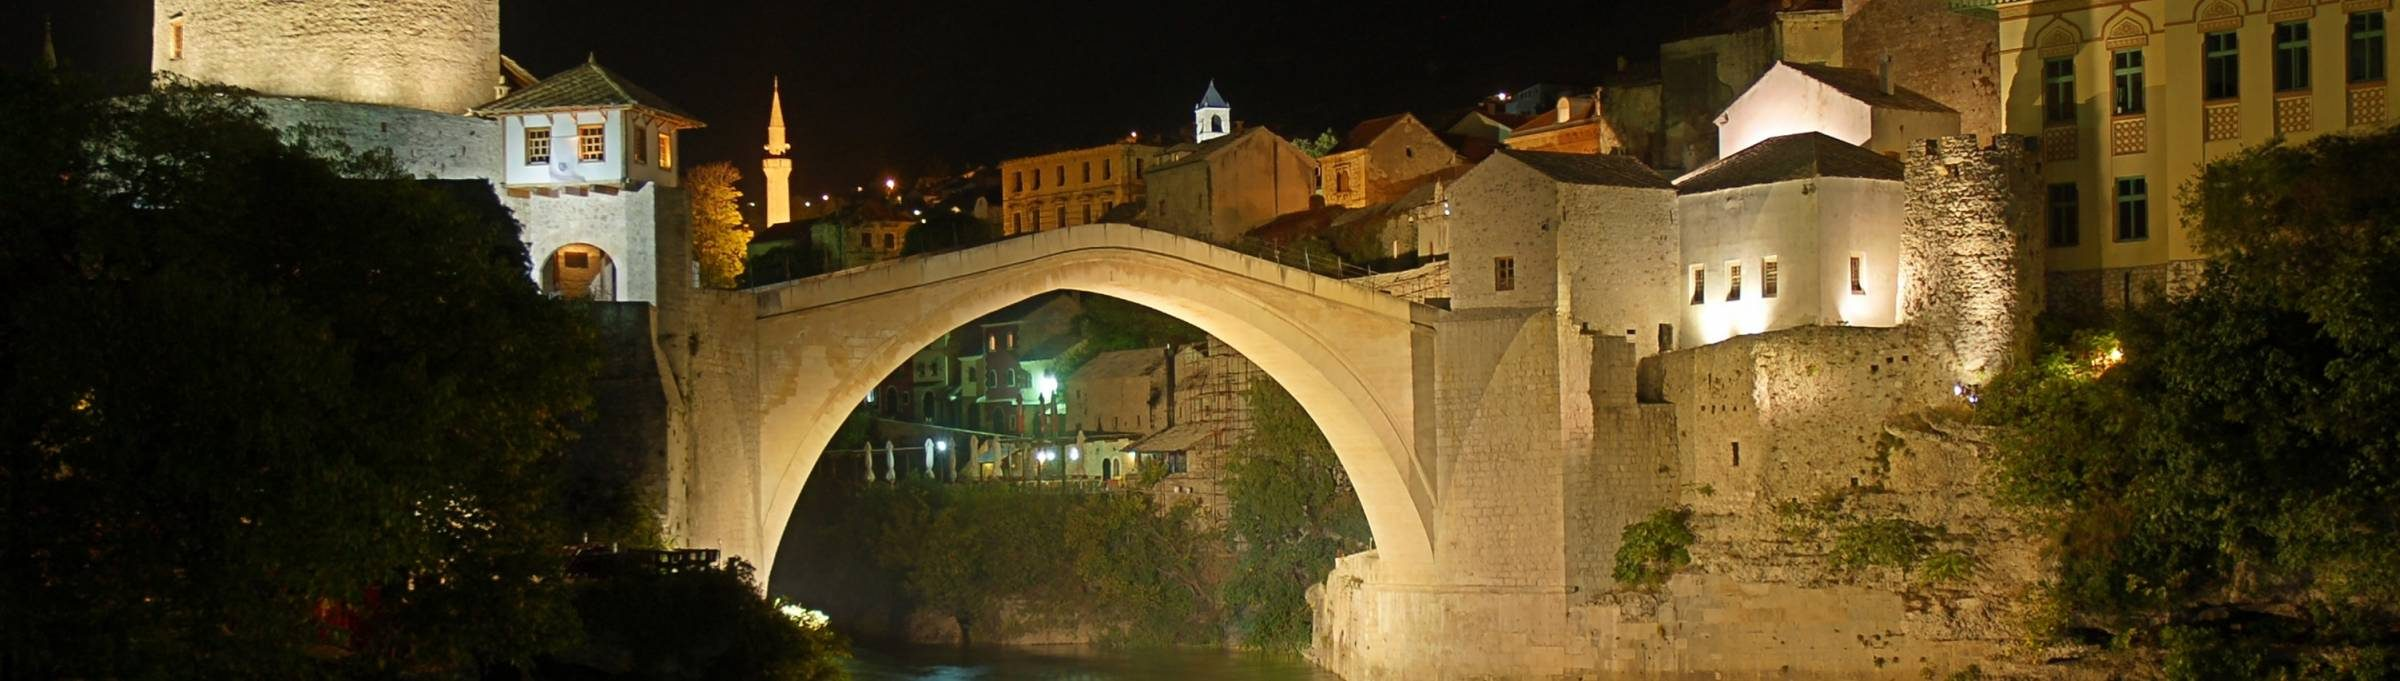 Building Bridges, Bridging Silos: Collaborating for Success Against Lead in Rochester